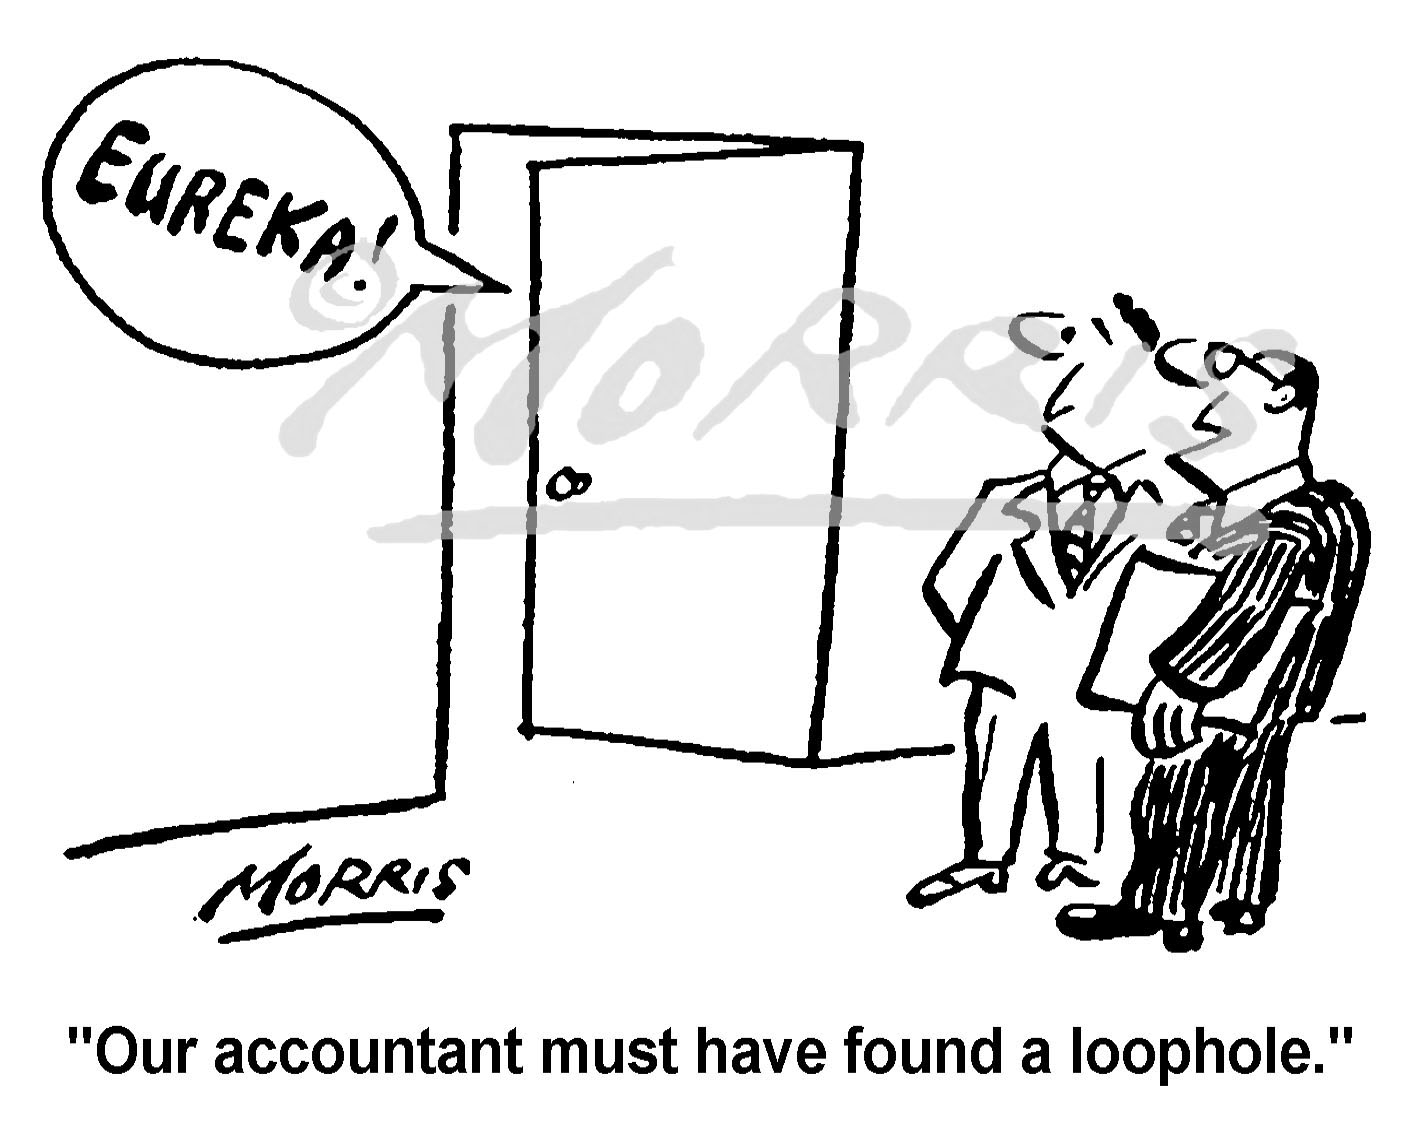 Company accountant business cartoon Ref: 0474bw